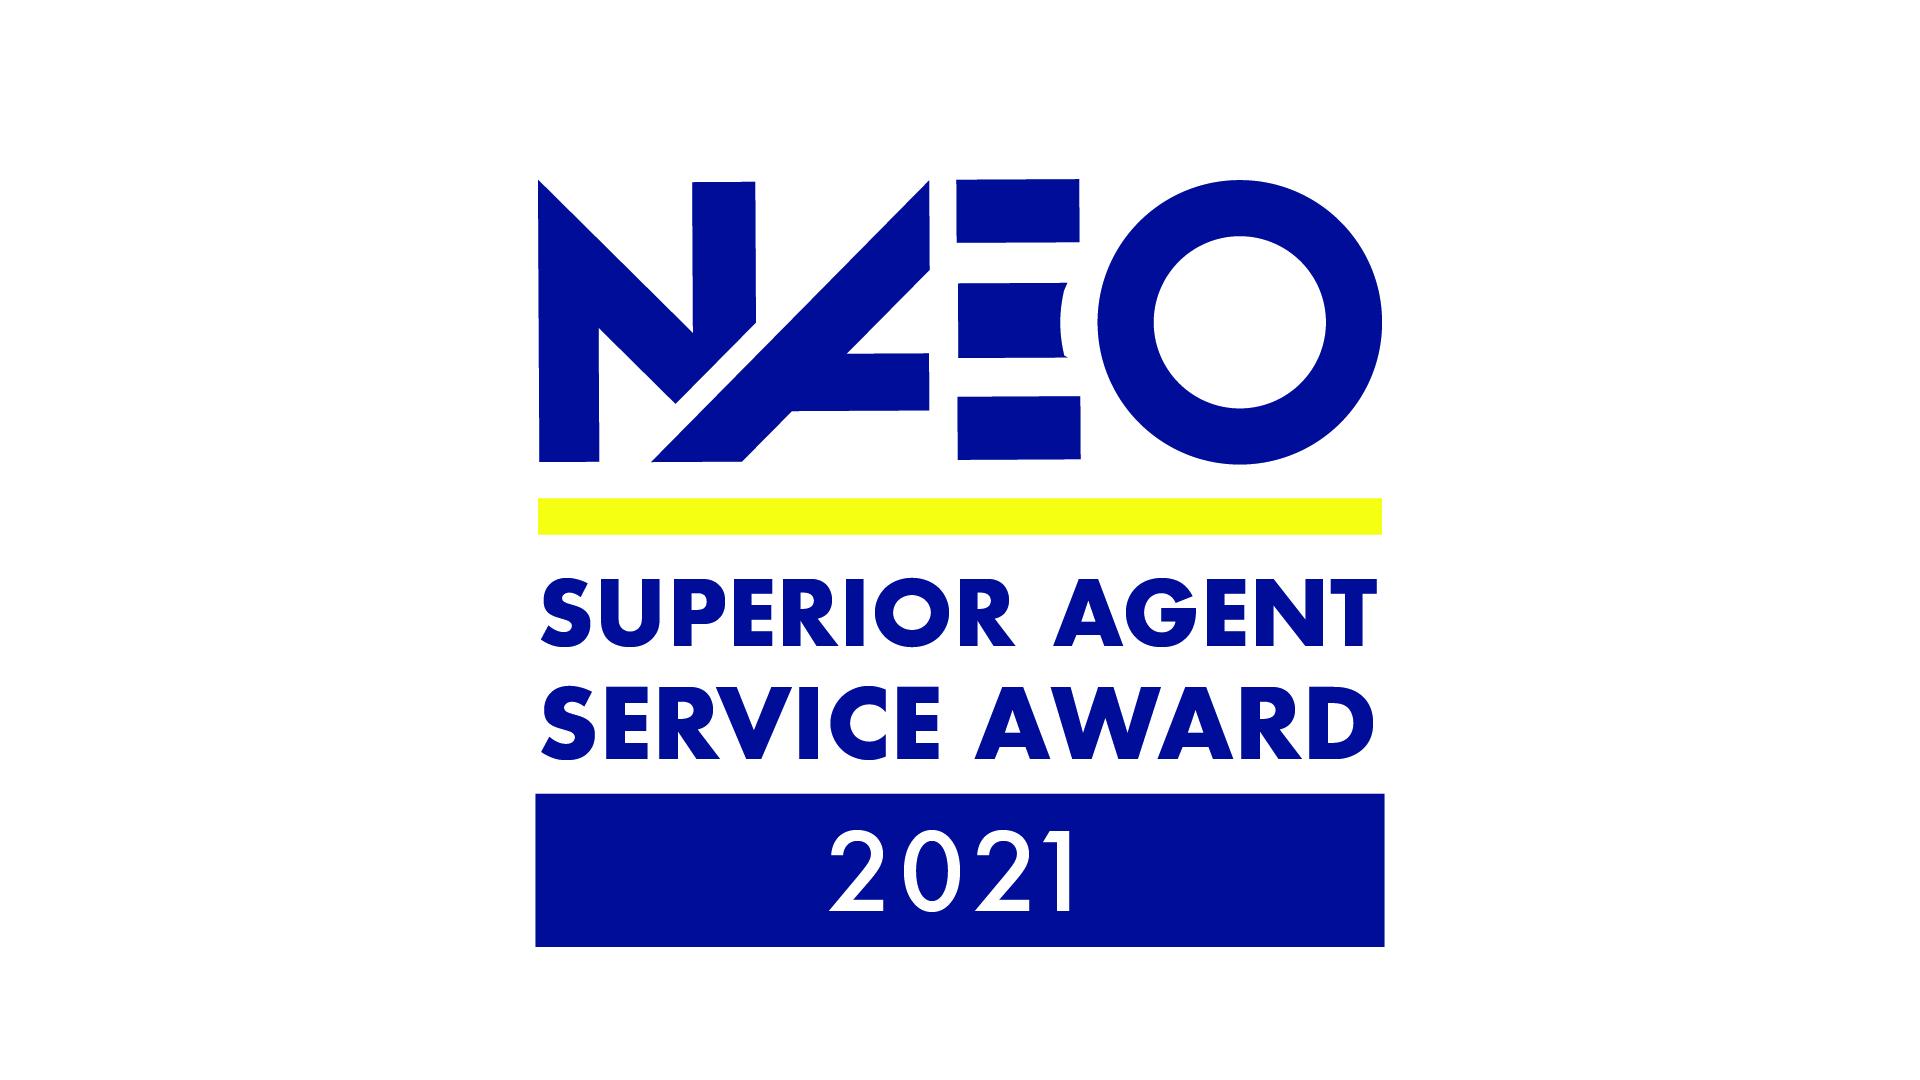 NAEO-Superior-Agent-Service-Award-Logo-2021-01